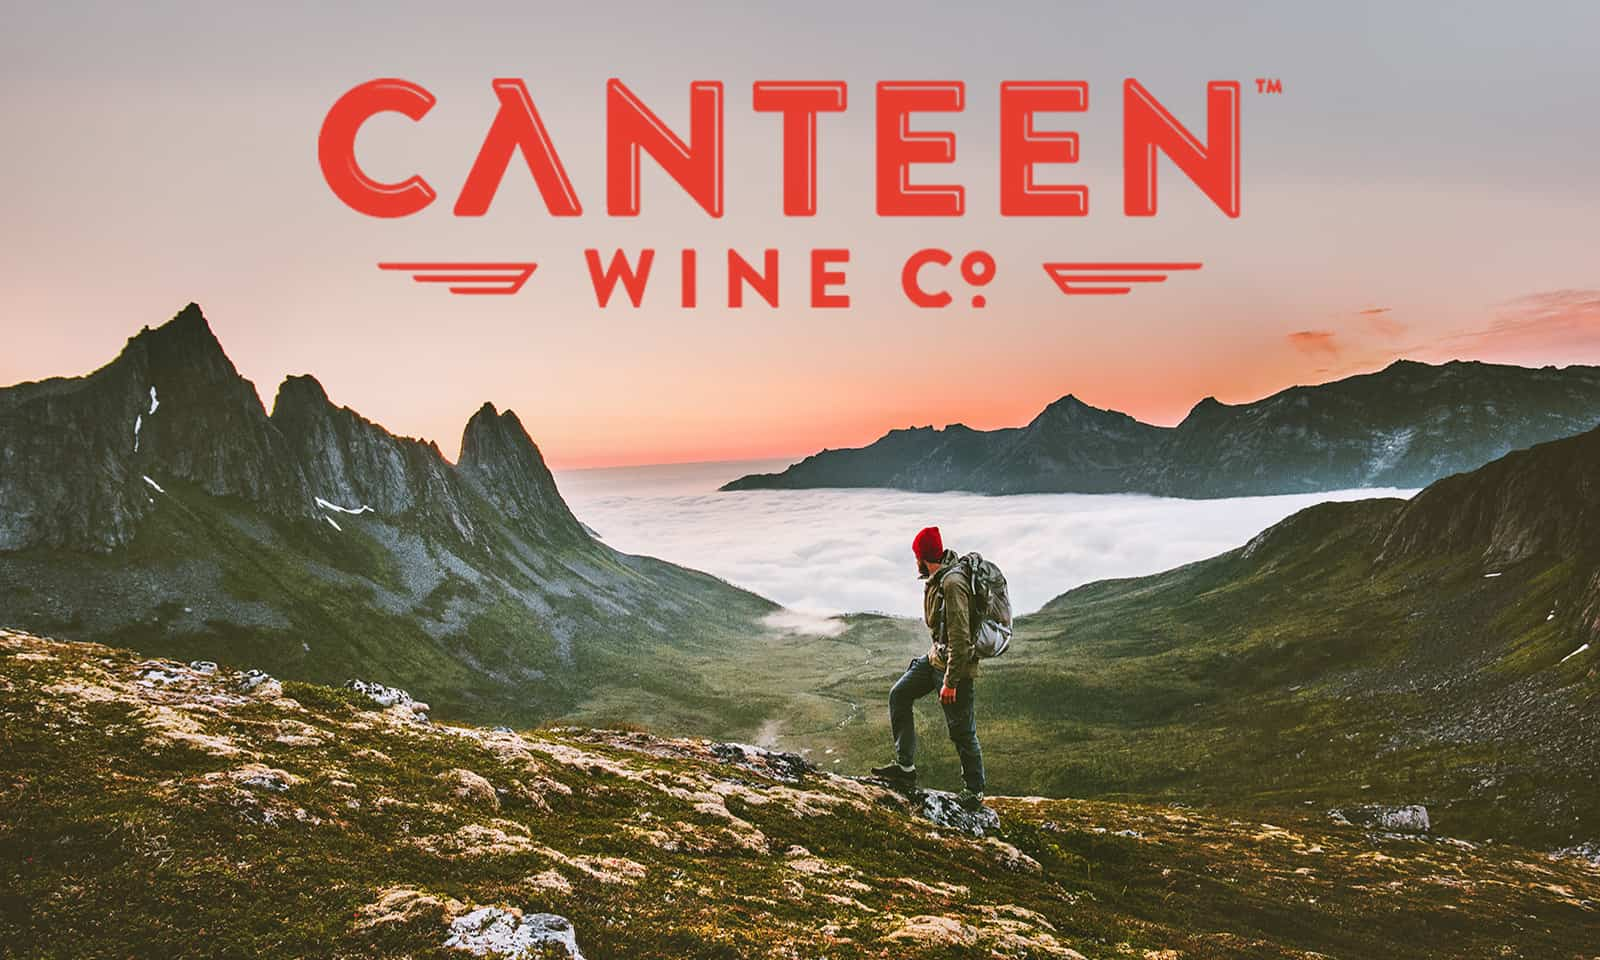 canteen-wine-company-explorer-adventure-hiking-wine